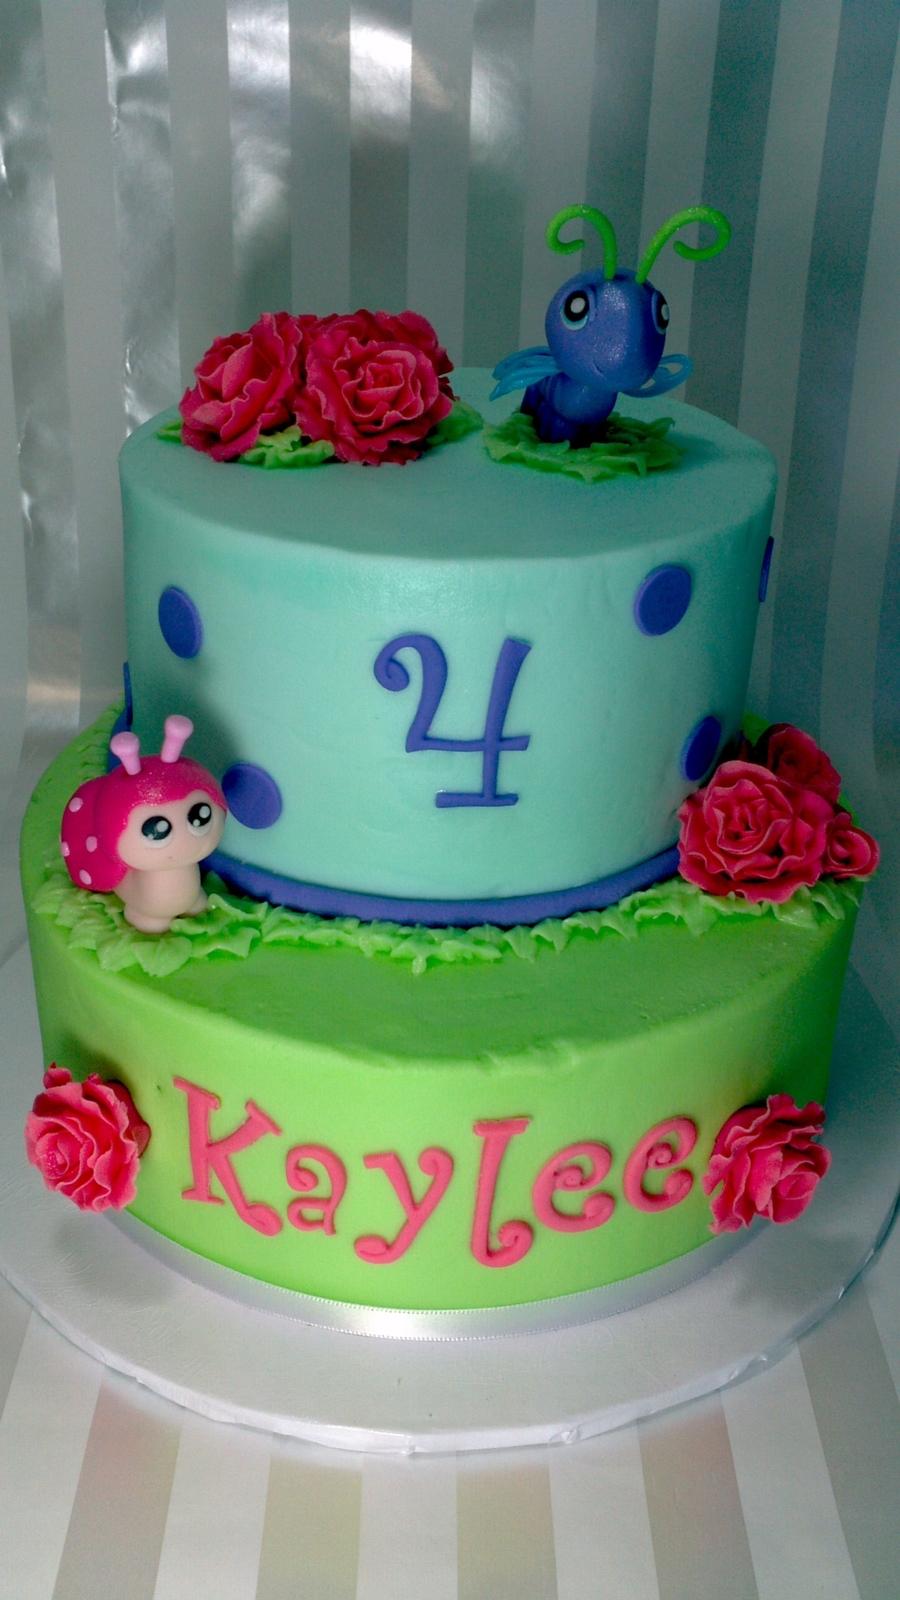 Birthday Cake Shop Palmerston North N Save Cakes